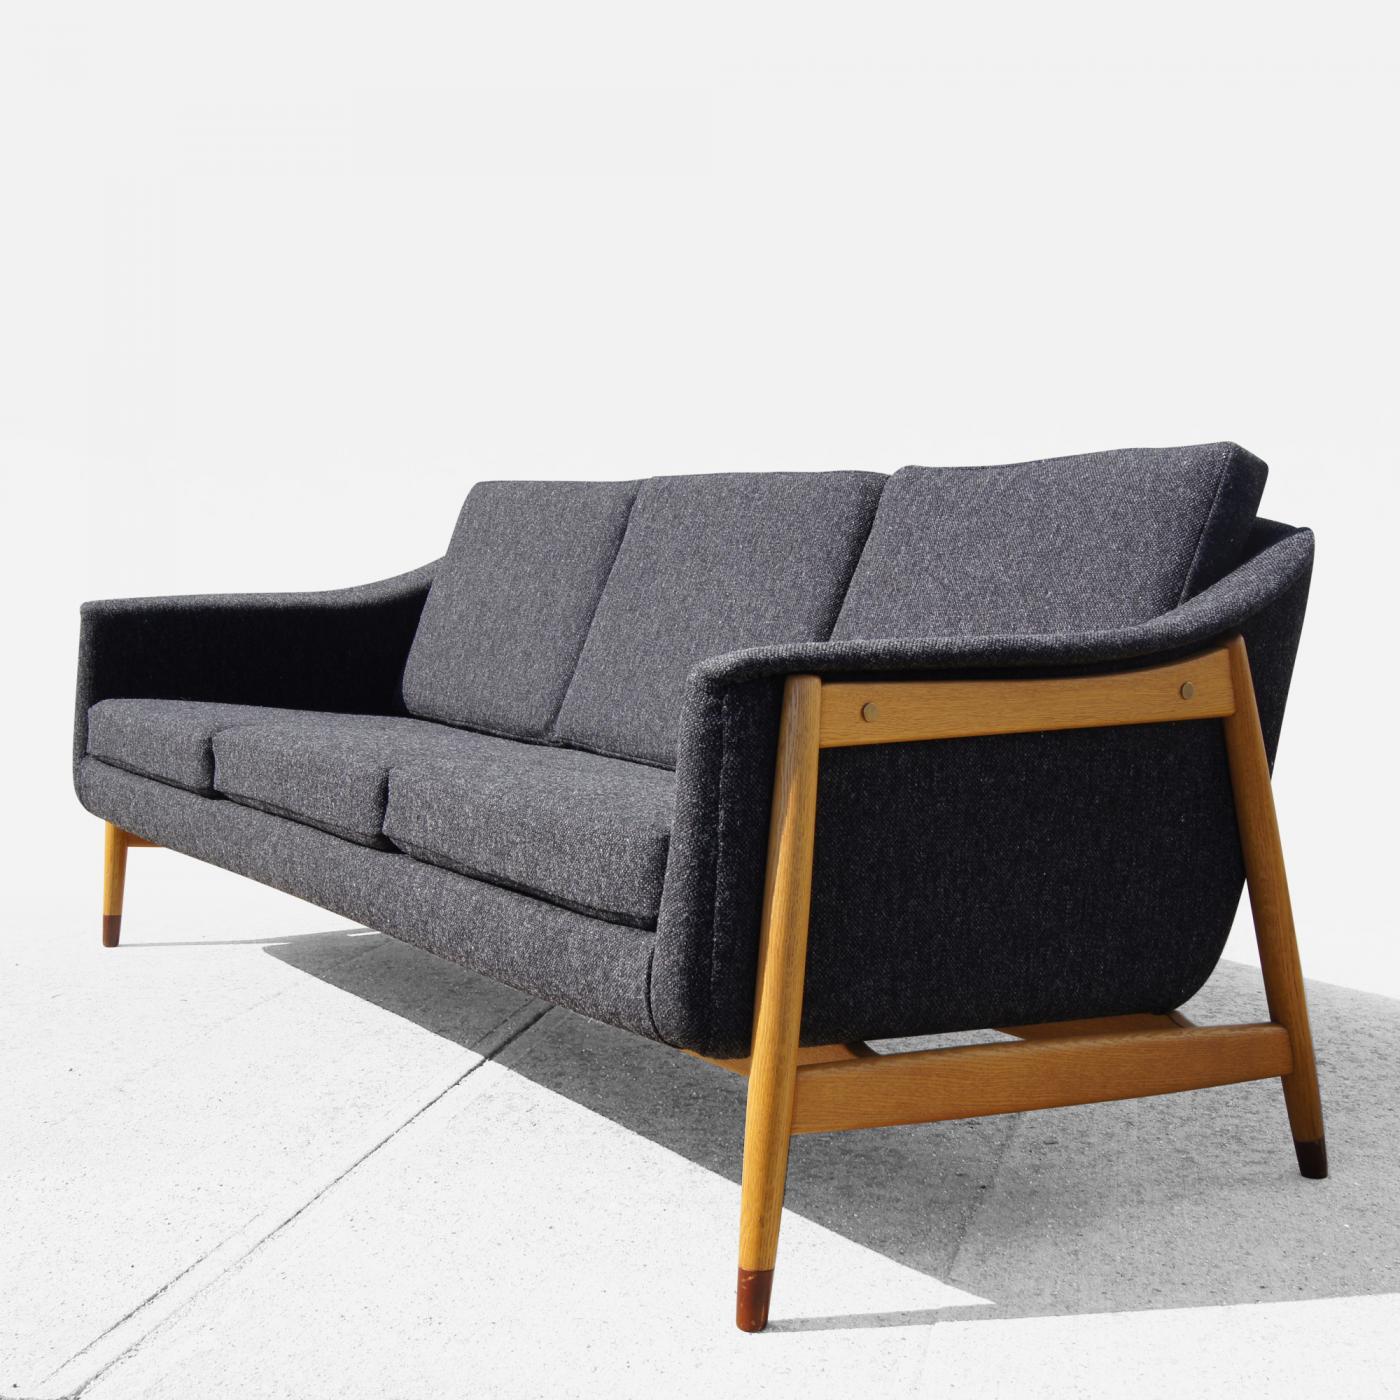 dux sofa by folke ohlsson sleeper loveseat three seat for